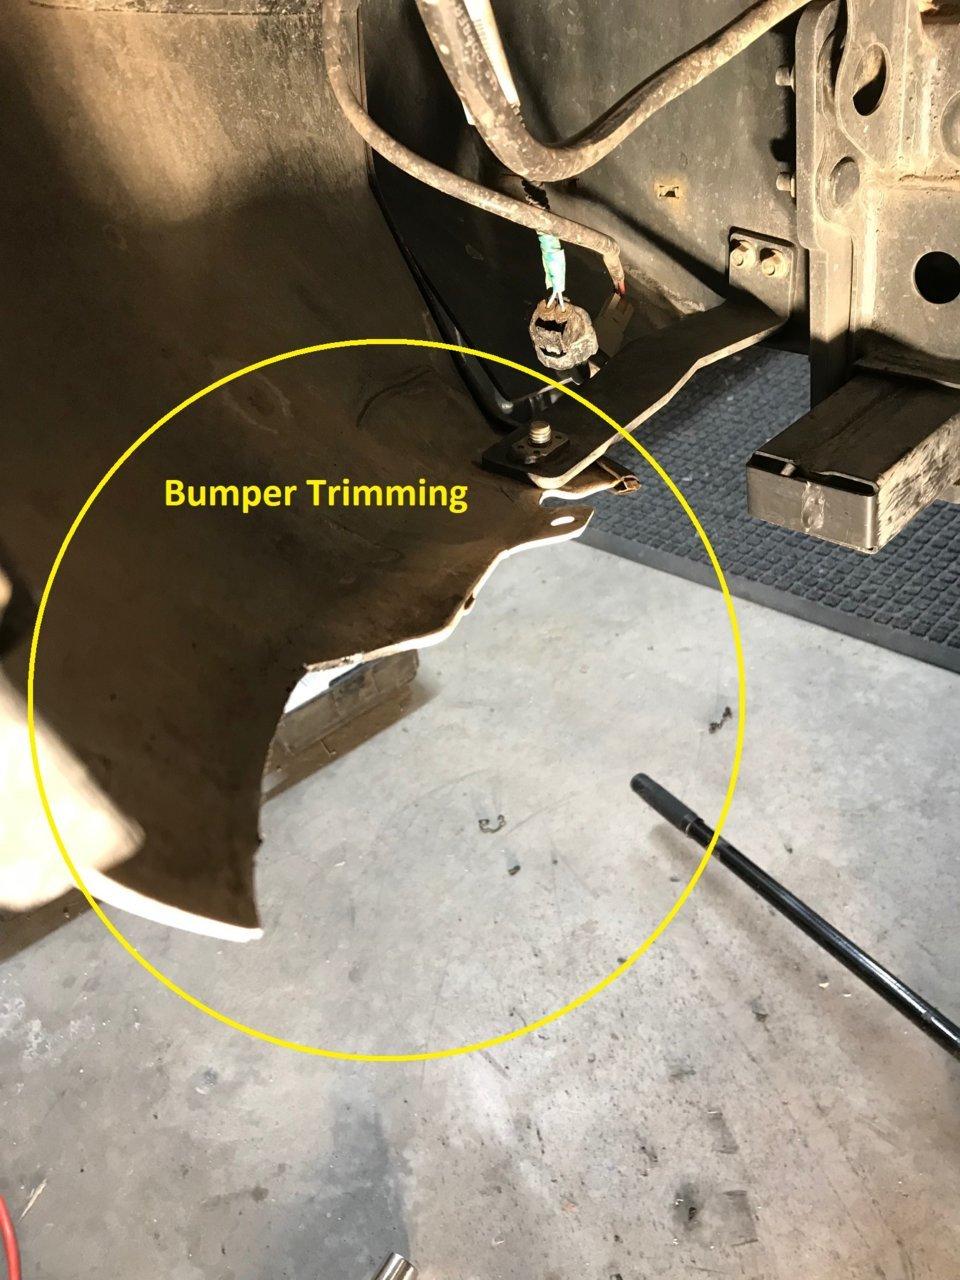 Bumper Trimming.jpg